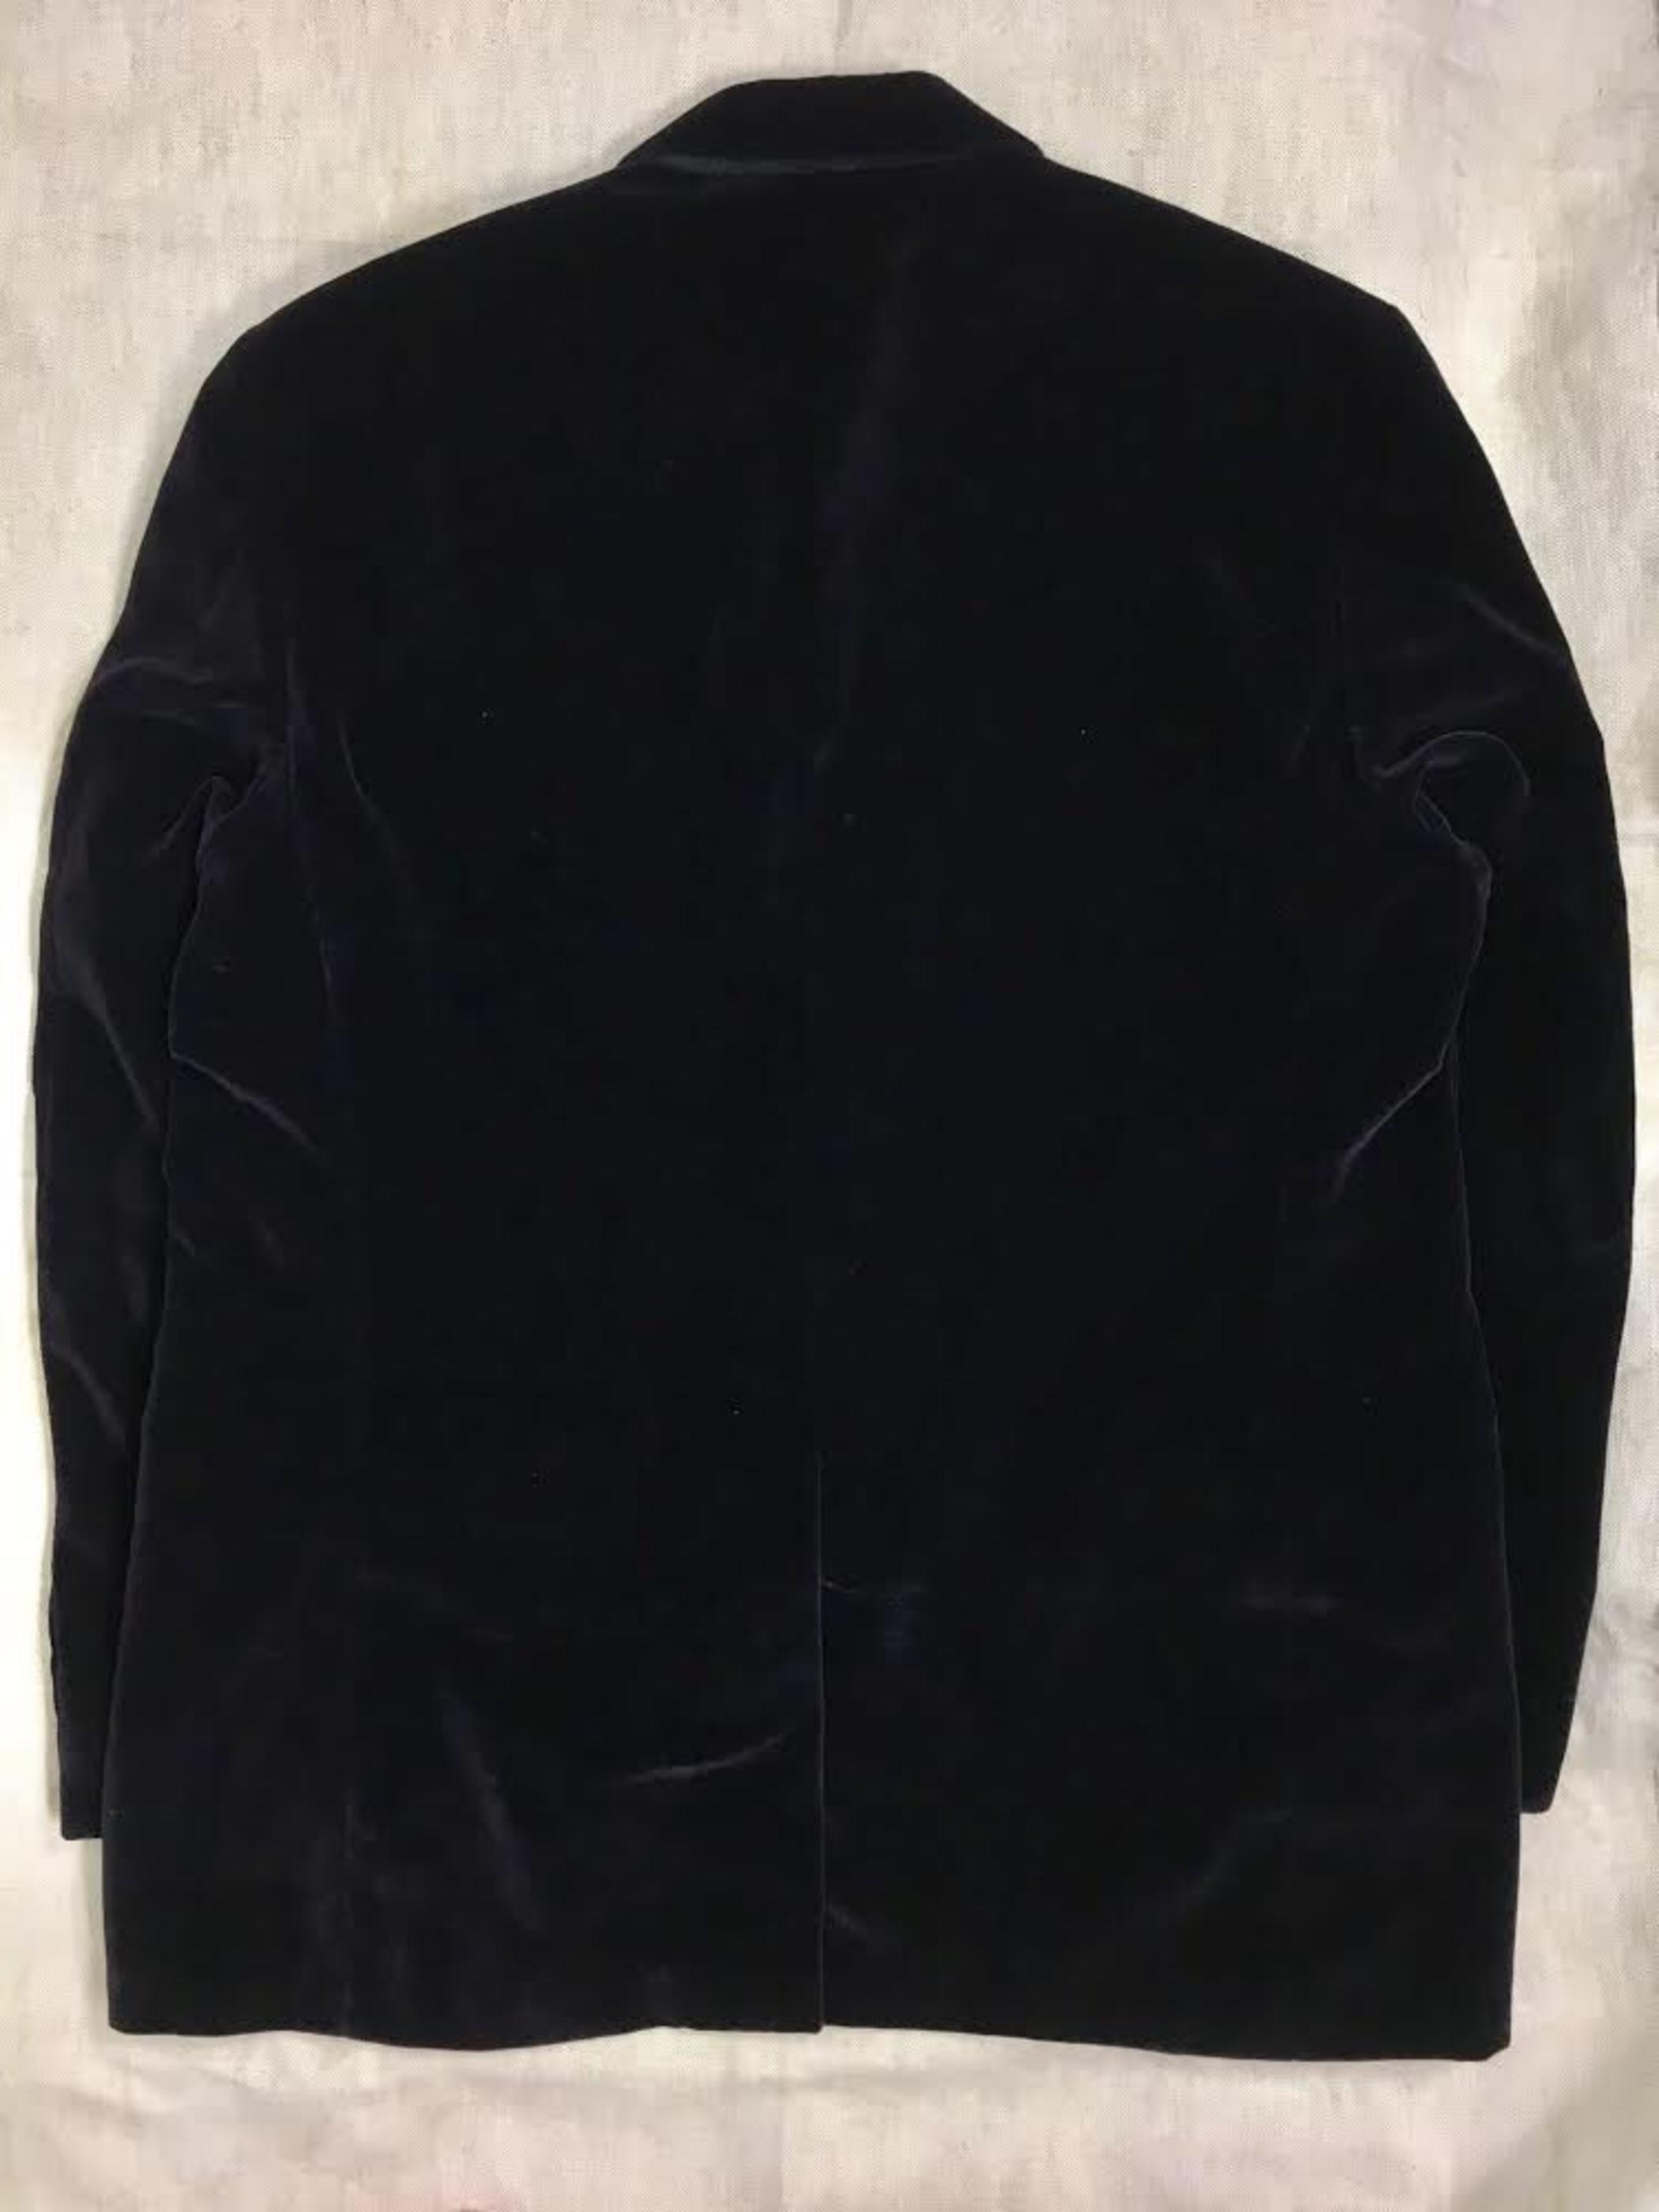 RALPH LAUREN Velour Tailored Jacket ラルフローレン ベロアテーラード